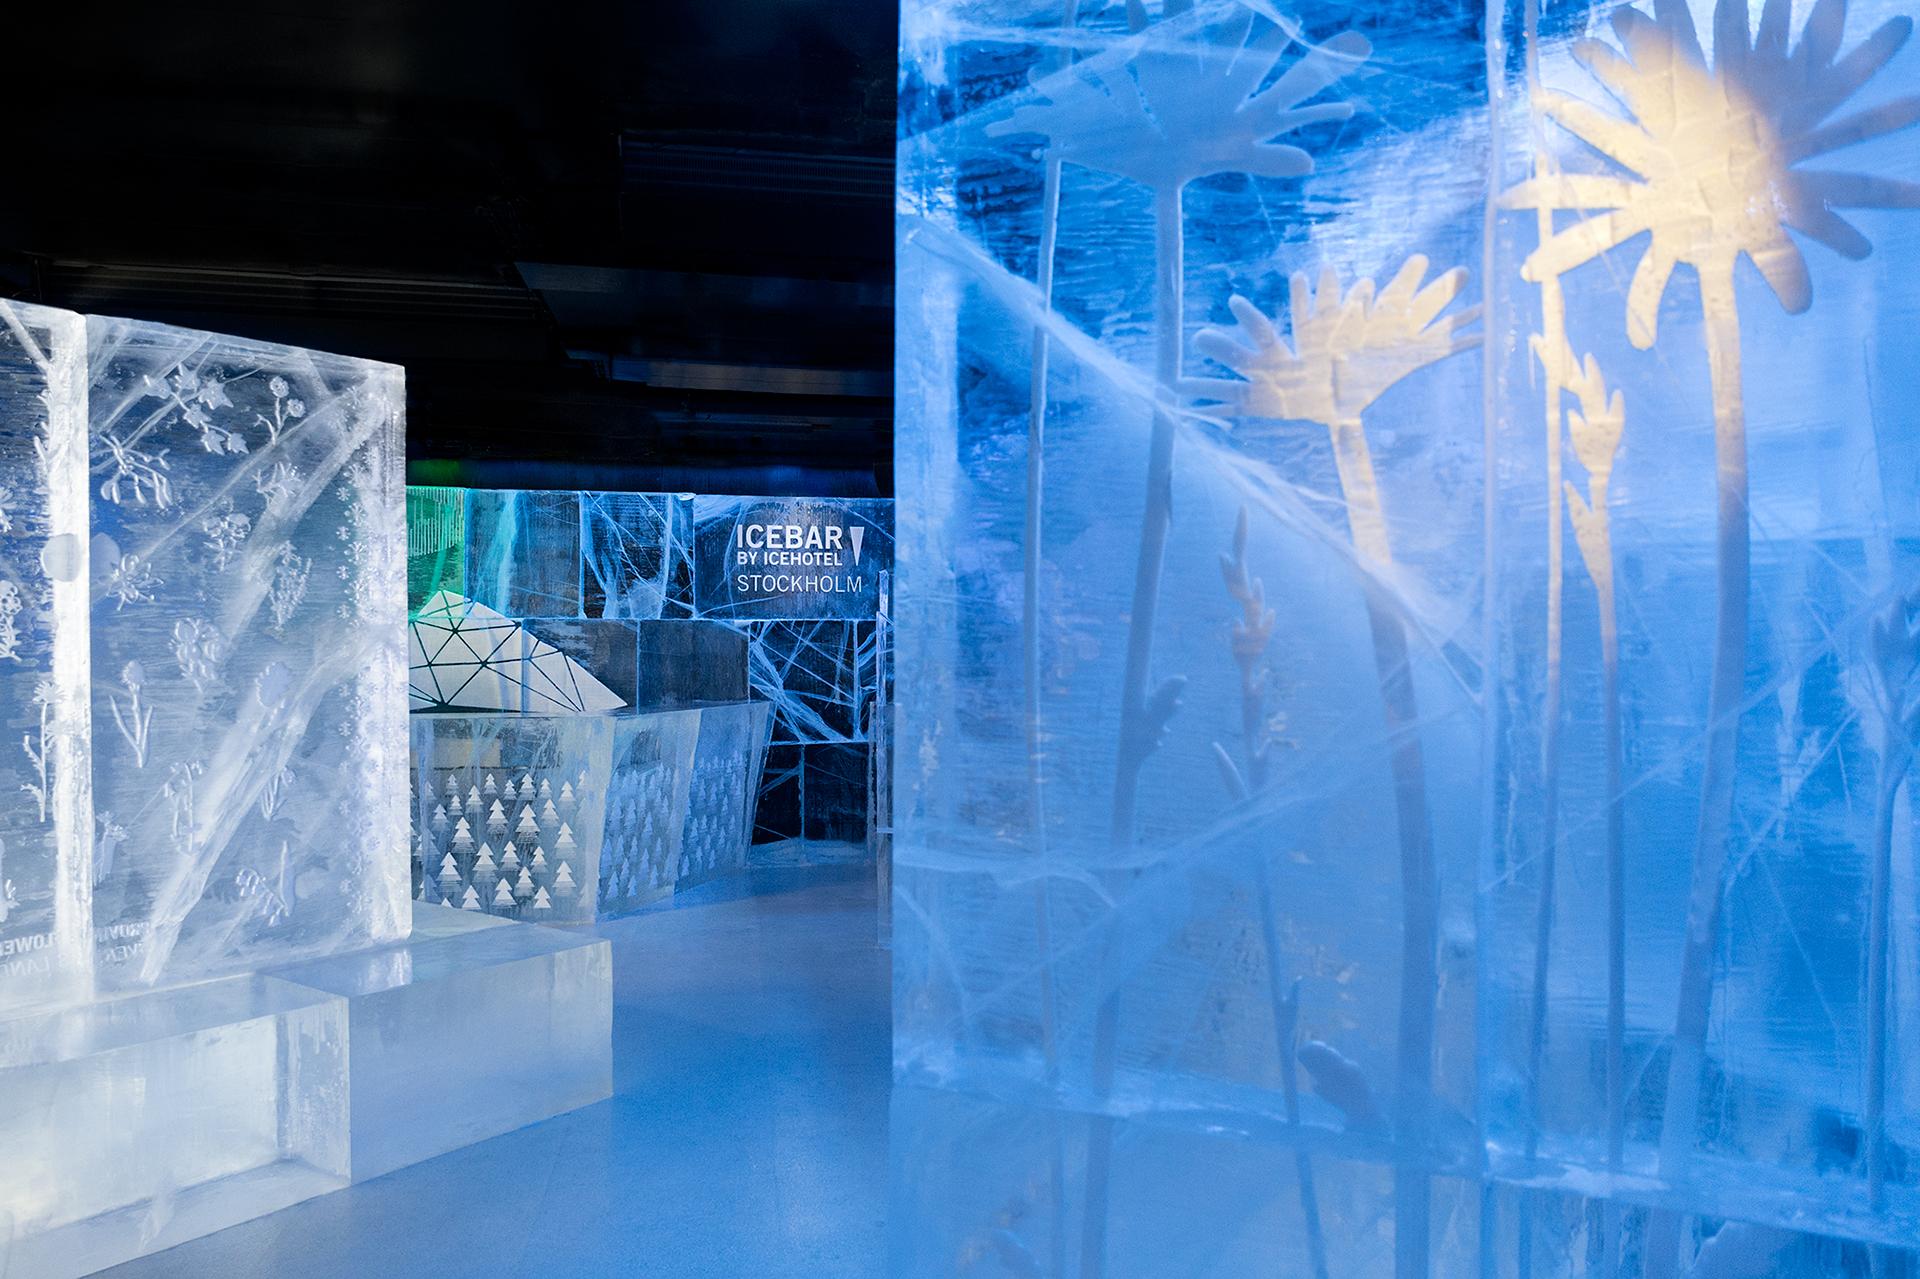 ICEBAR BY ICEHOTEL STOCKHOLM, Nordic C Hotel, Northbound Adventure! Design by: Christian Strömqvist & Kalle Ekeroth